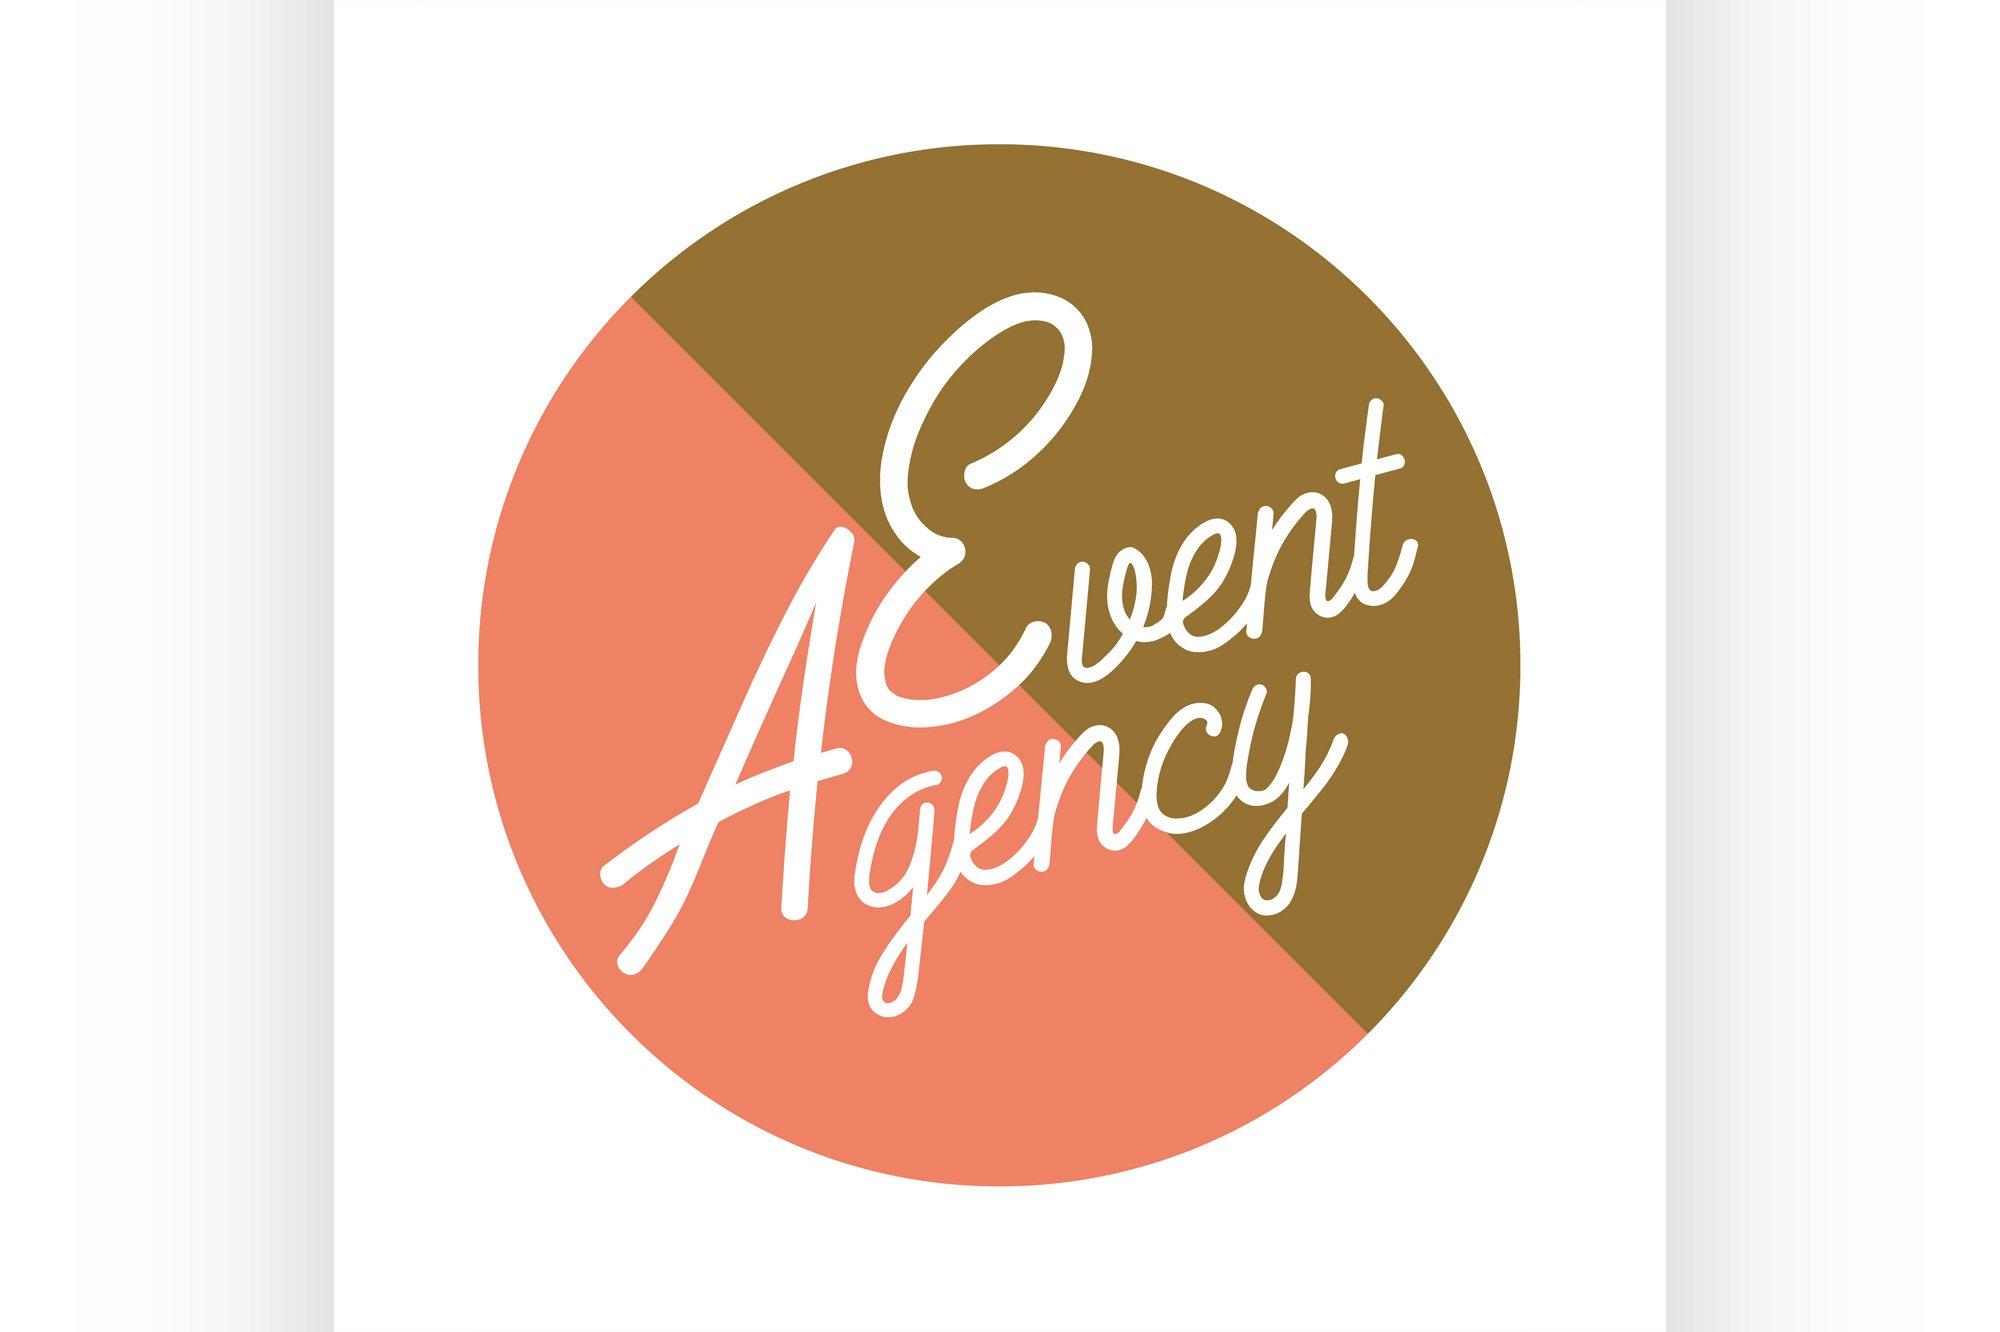 Color vintage event agency emblem example image 1